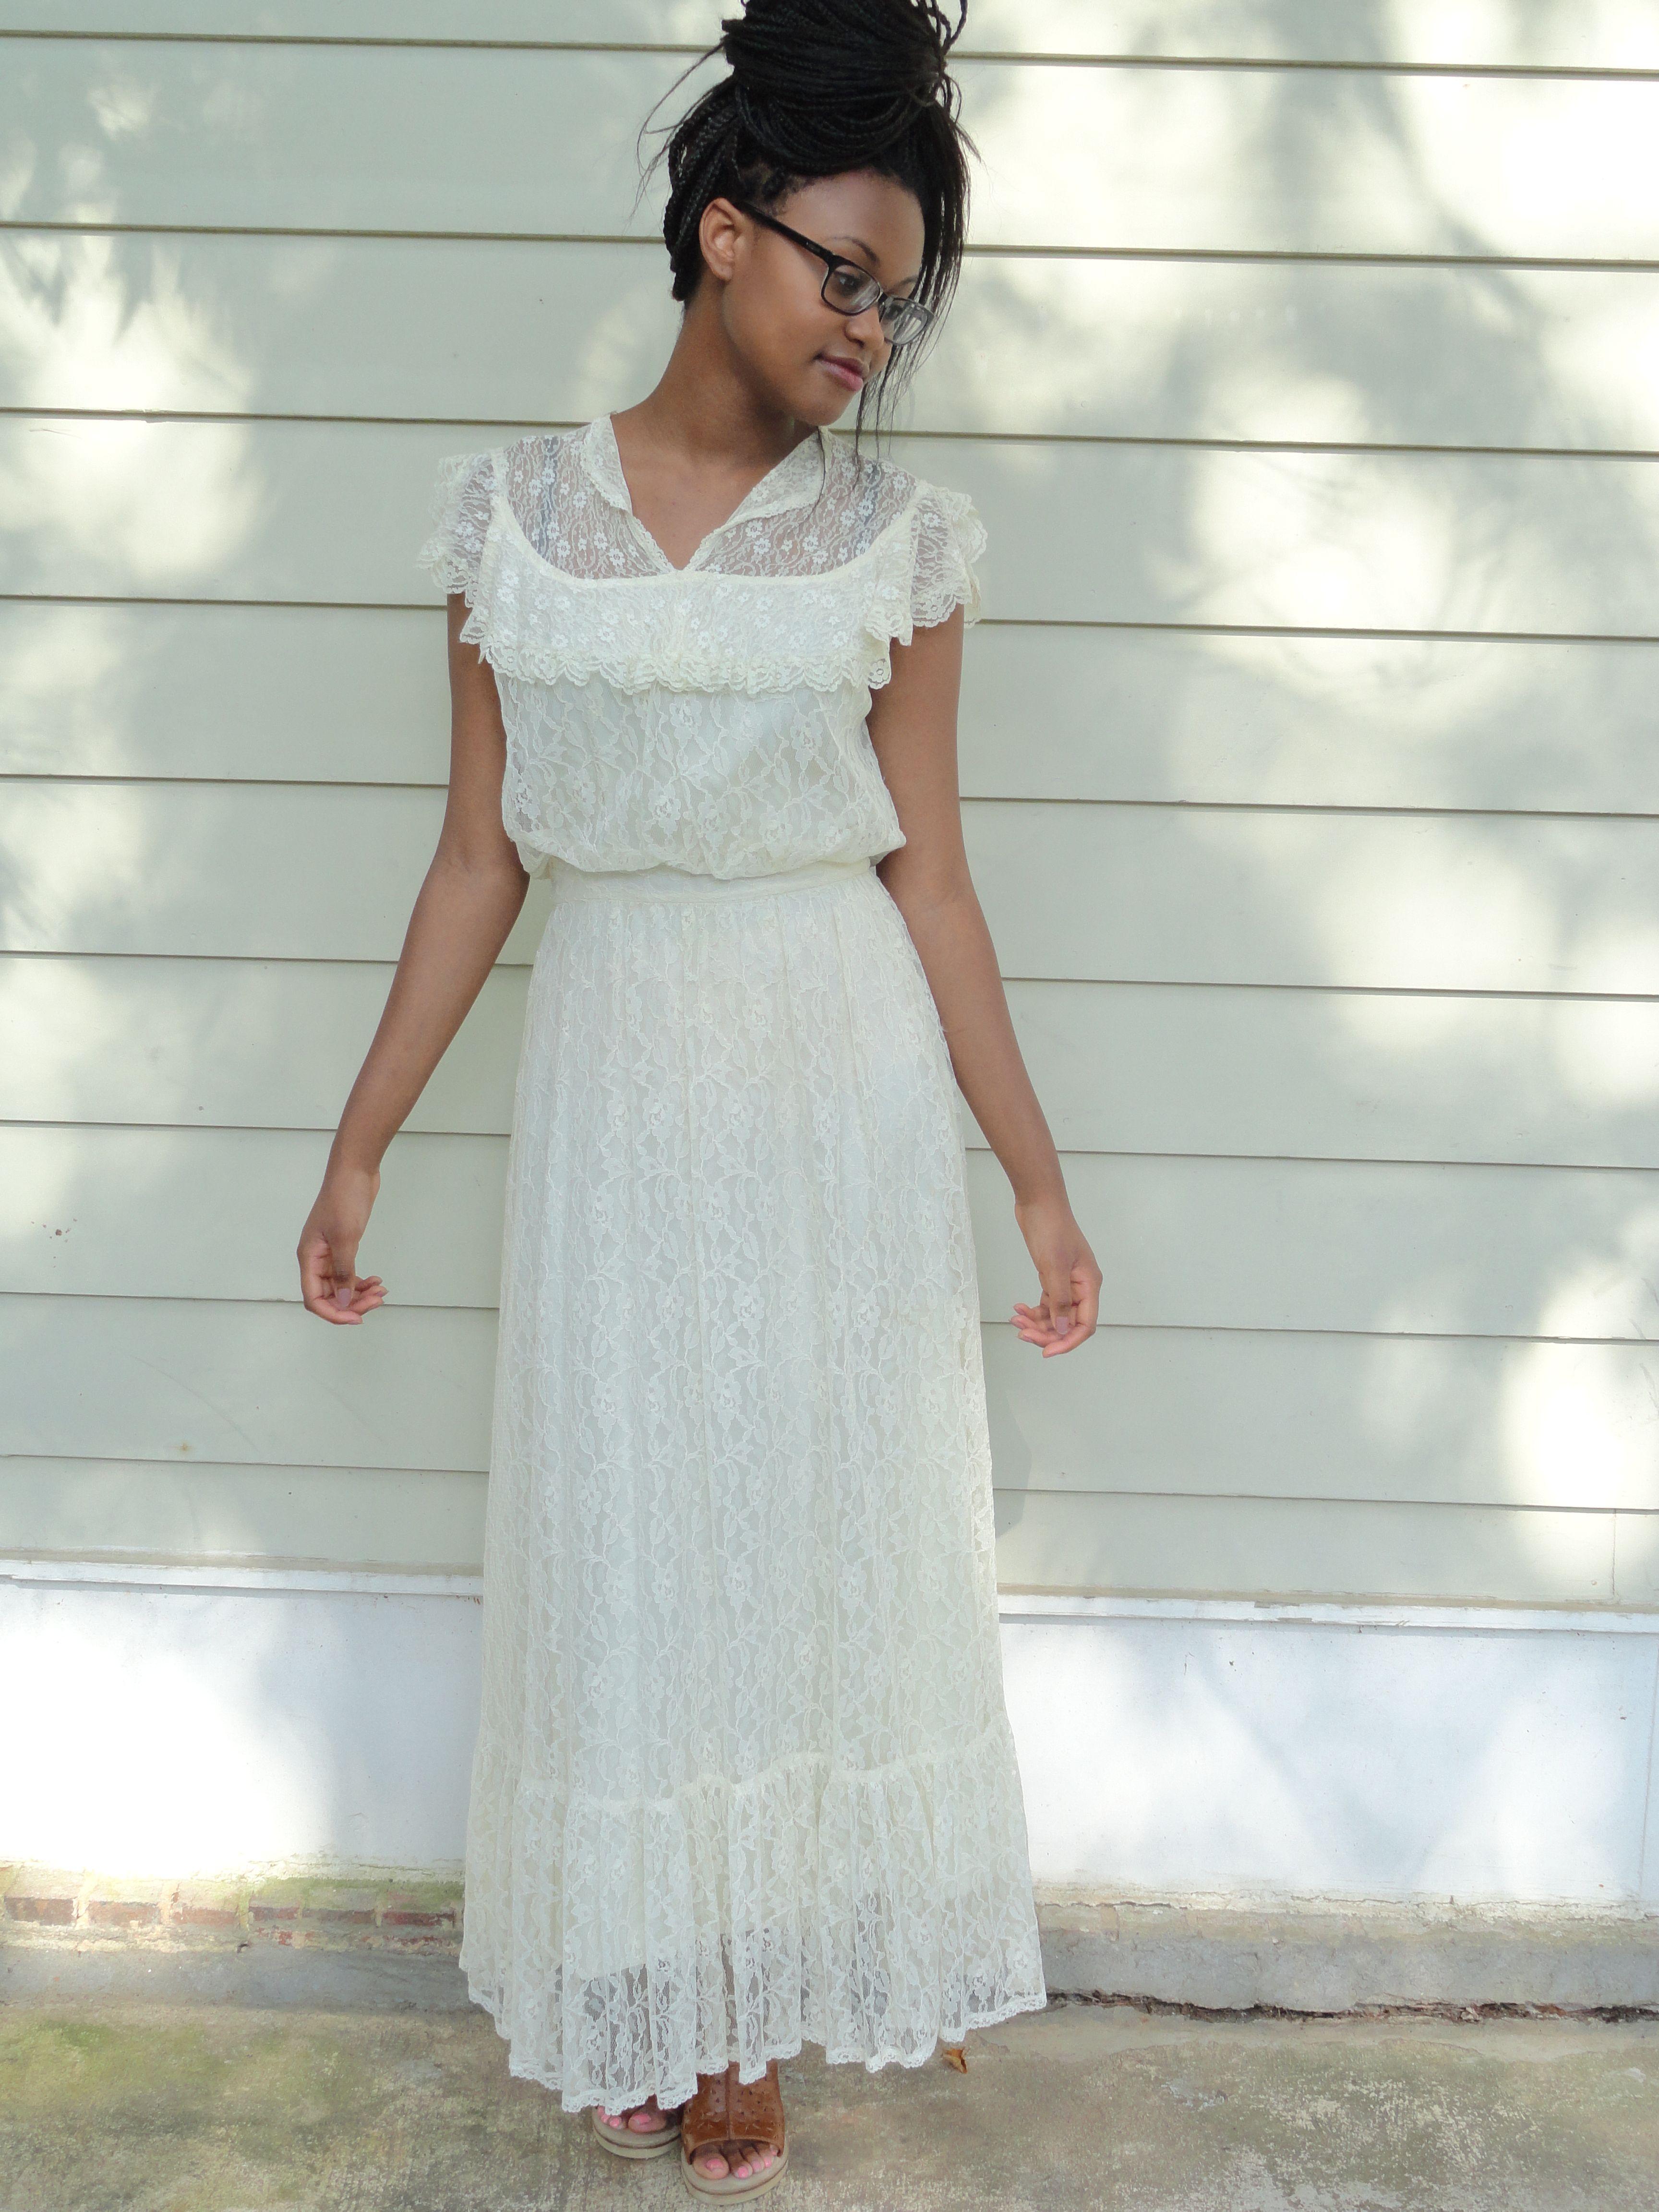 Fashion For The Young Bride Flowy Free Wedding Dress Black Brides Vintage Wedding Dresses Black Bride Vintage Bride Young Bride [ 4608 x 3456 Pixel ]